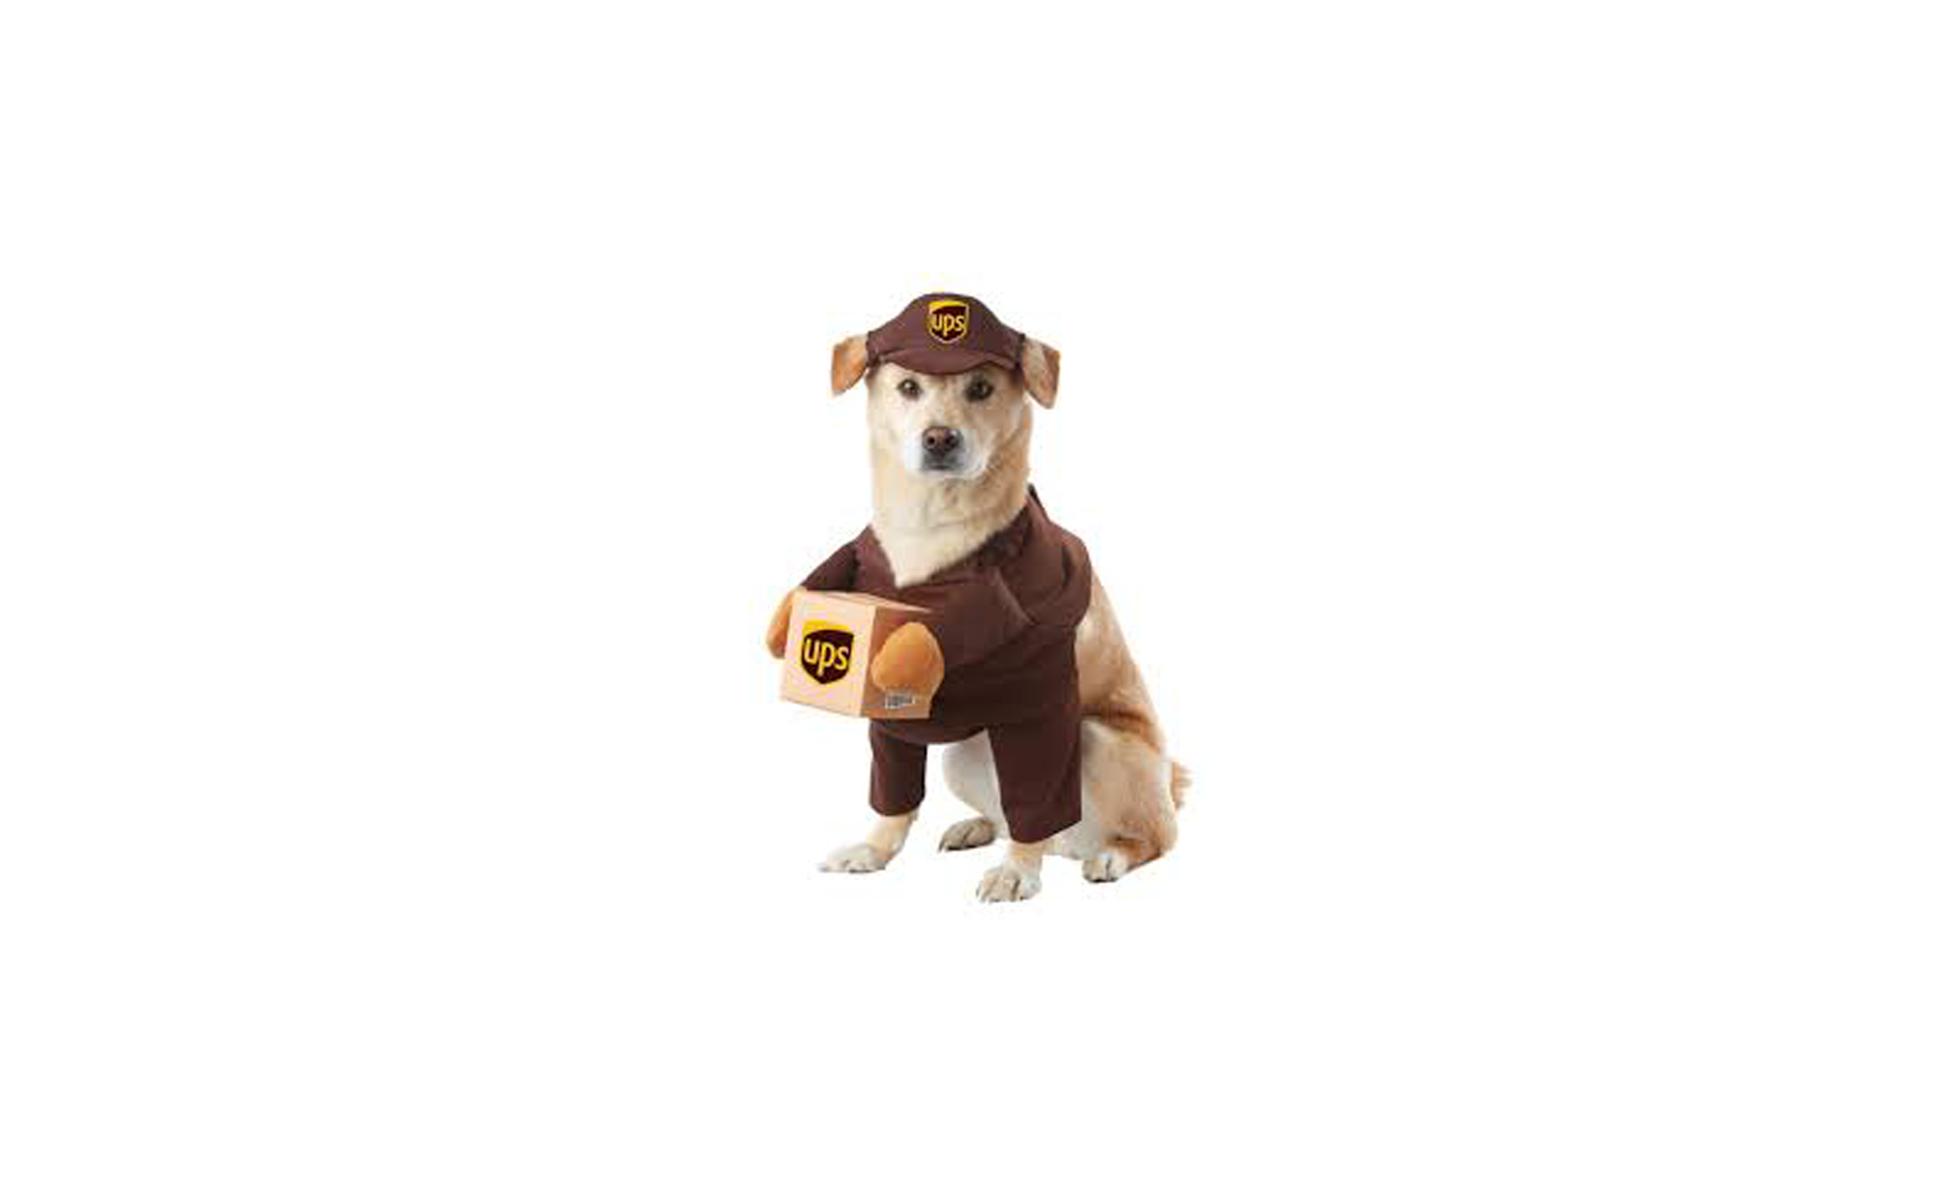 UPS Dog Costume on Amazon